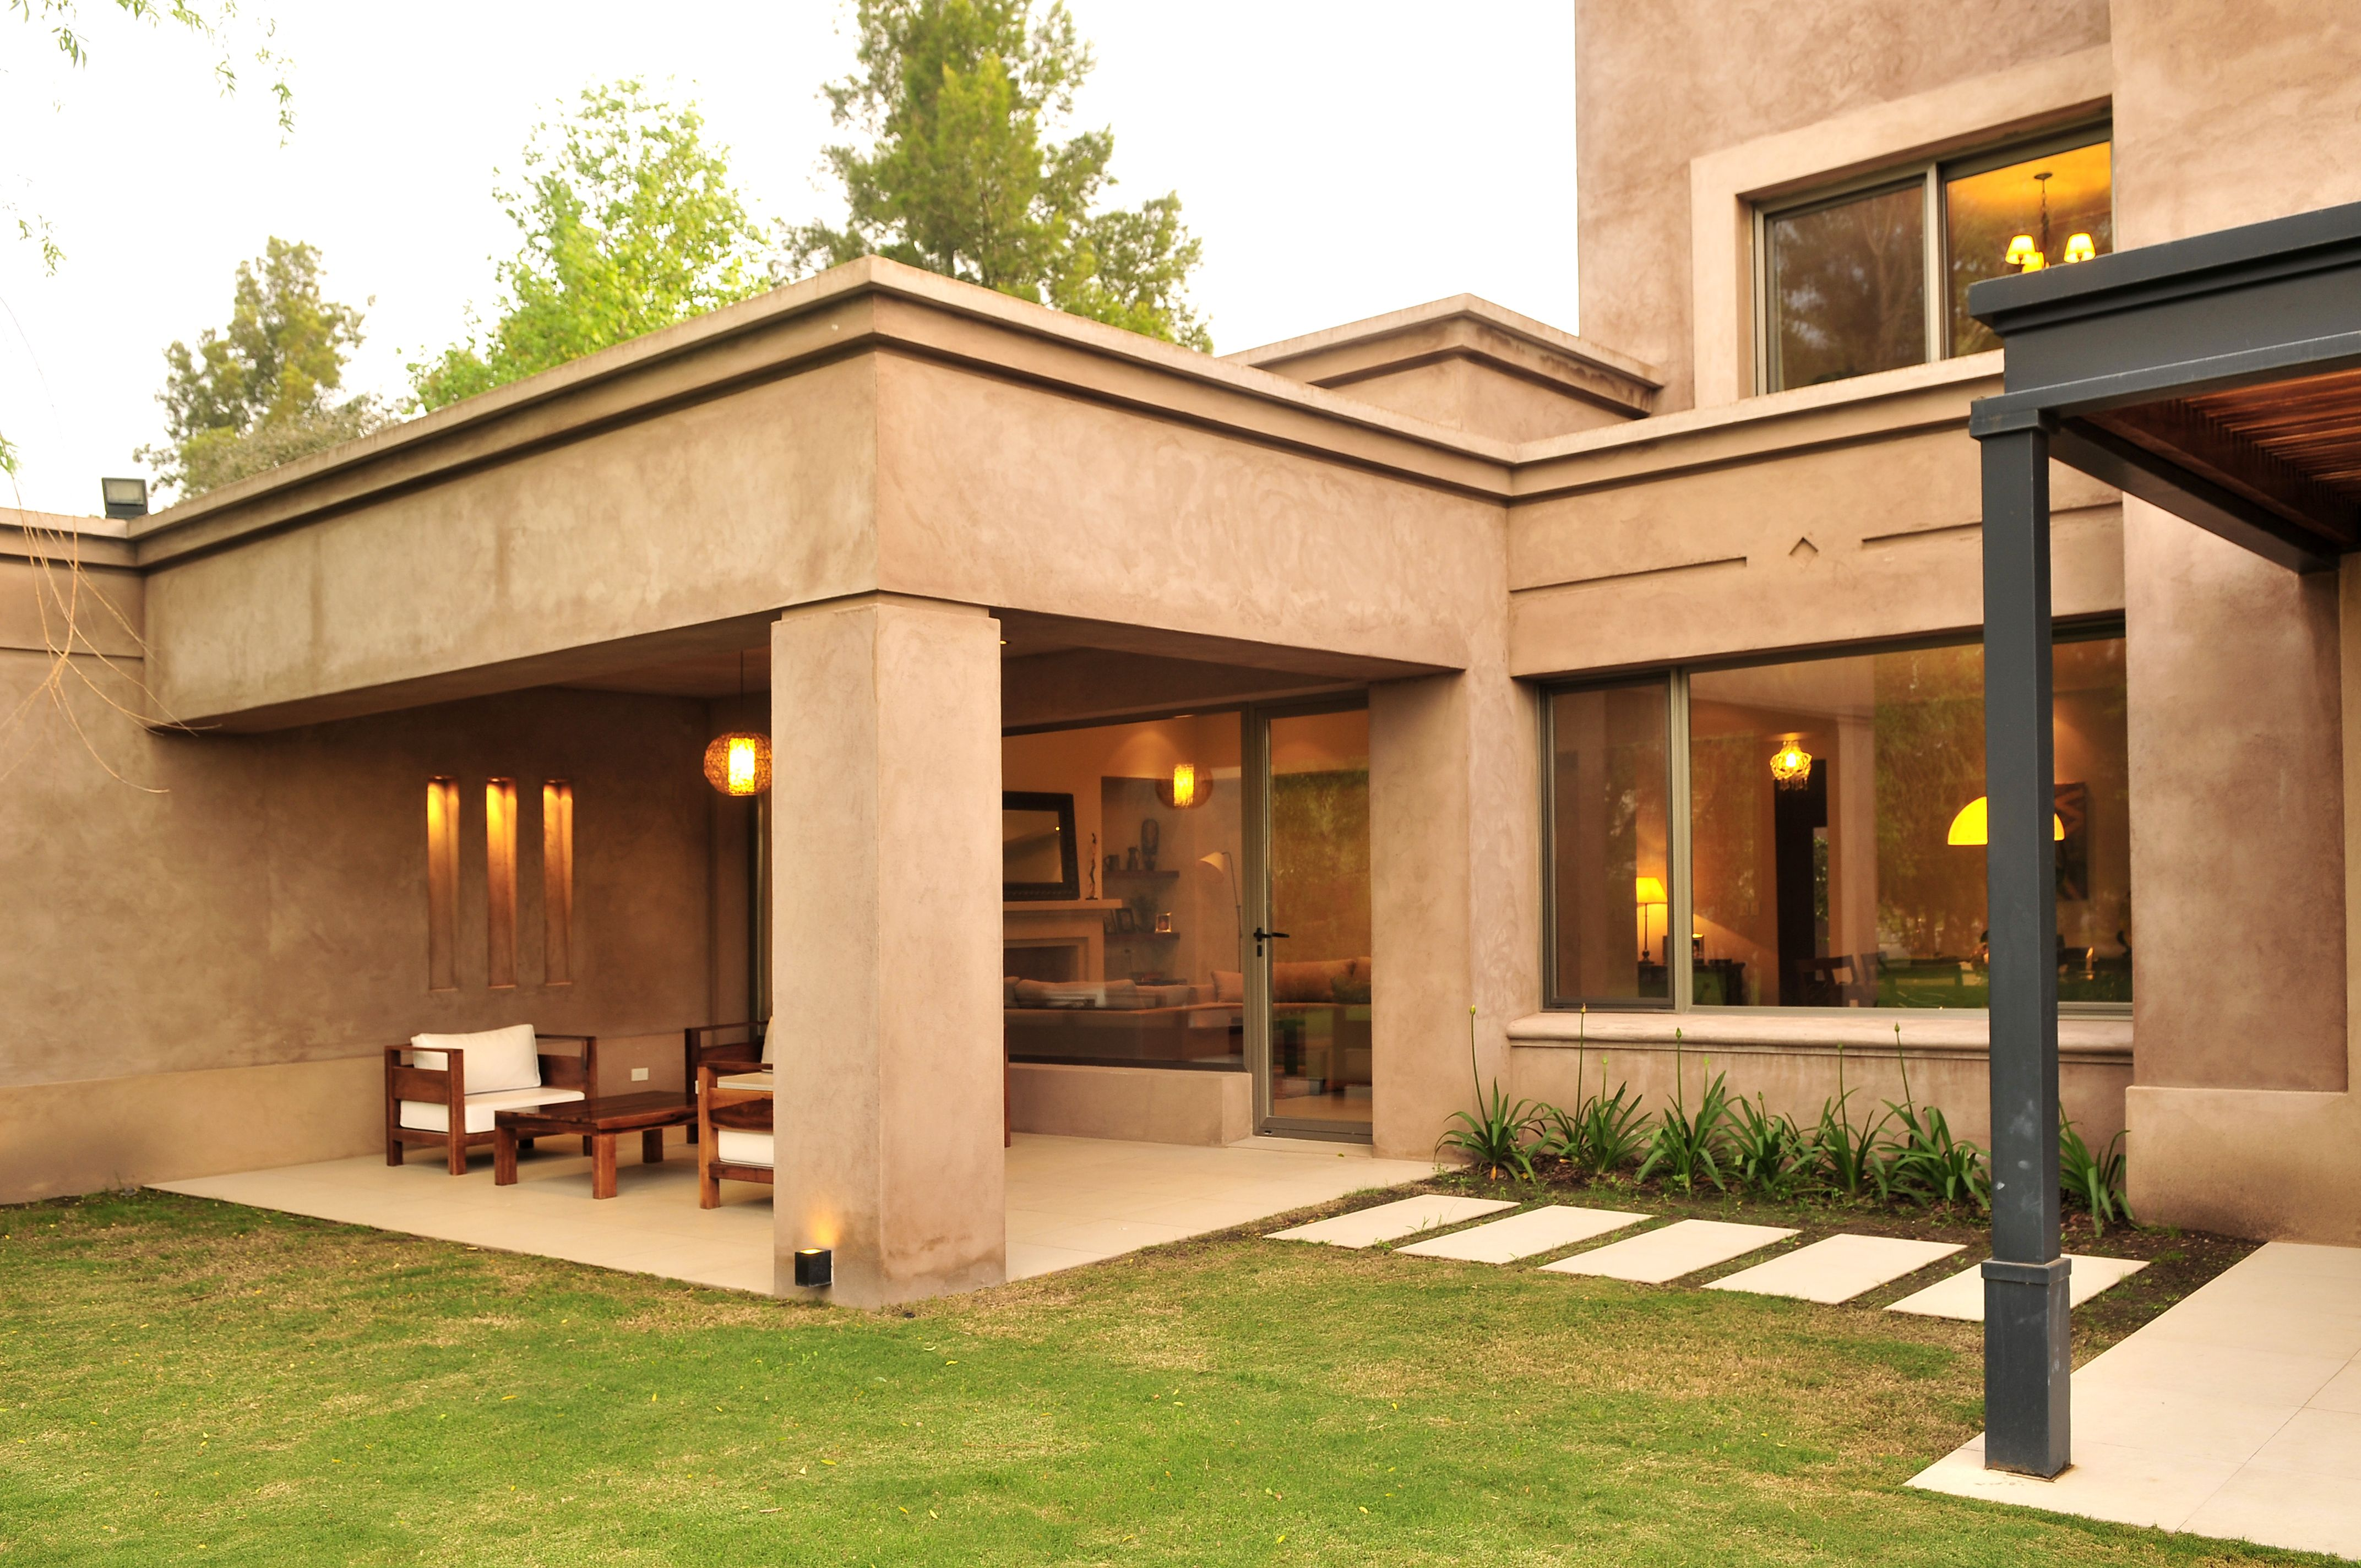 Arquitectura paisajismo ricardo pereyra iraola buenos aires argentina galeria casa - Casas clasicas modernas ...